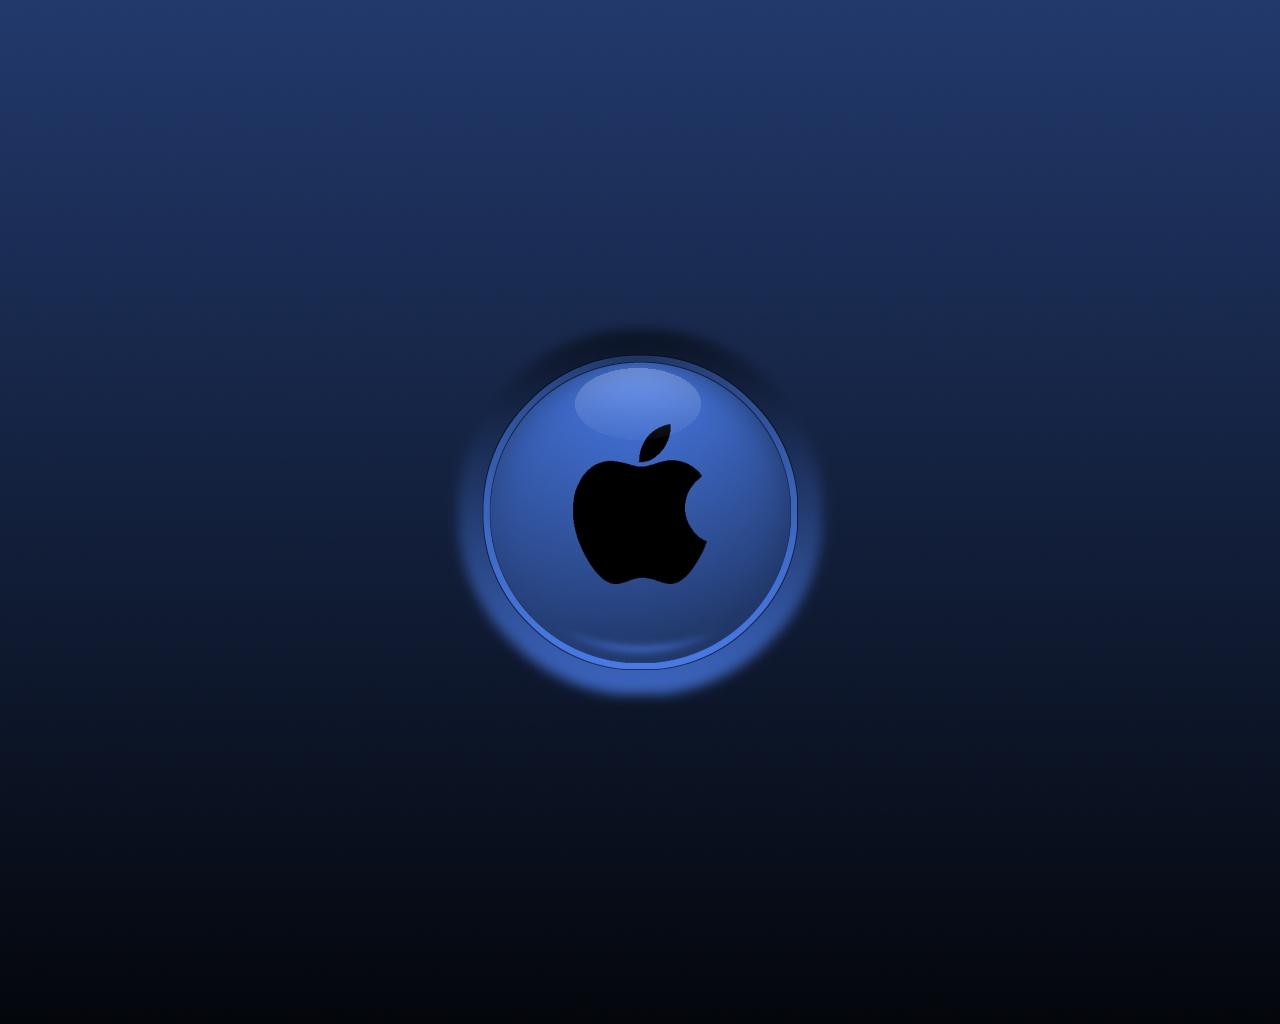 Apple Desktop Wallpaper Blue HD wallpaper background 1280x1024